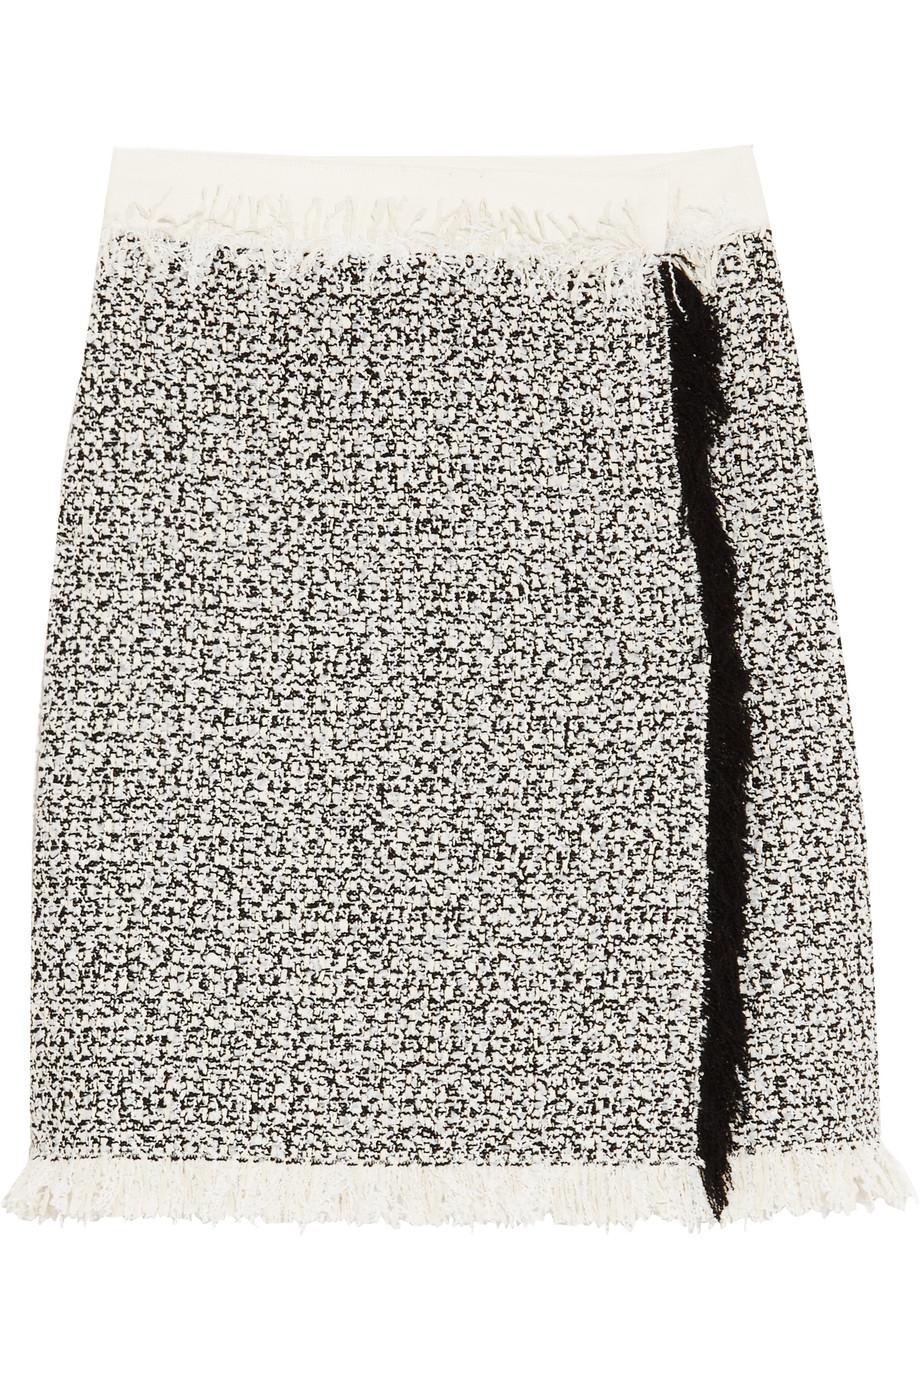 Lanvin Fringed Cotton-Blend Tweed Mini Skirt, Ivory, Women's, Size: 42